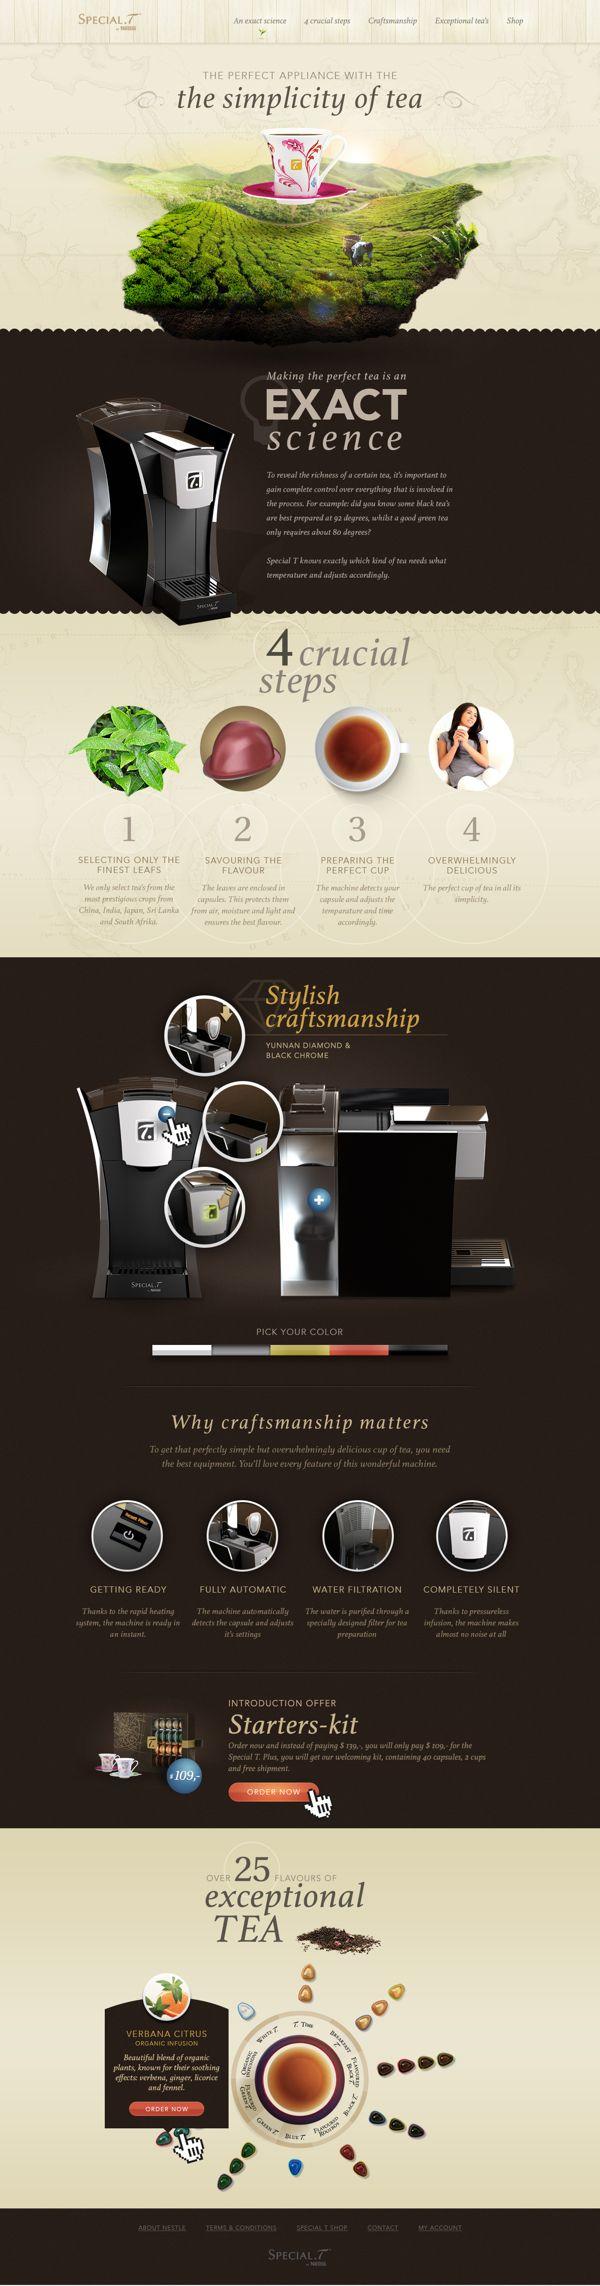 Special-Tea - Redesign by Michiel Andrea, via Behance